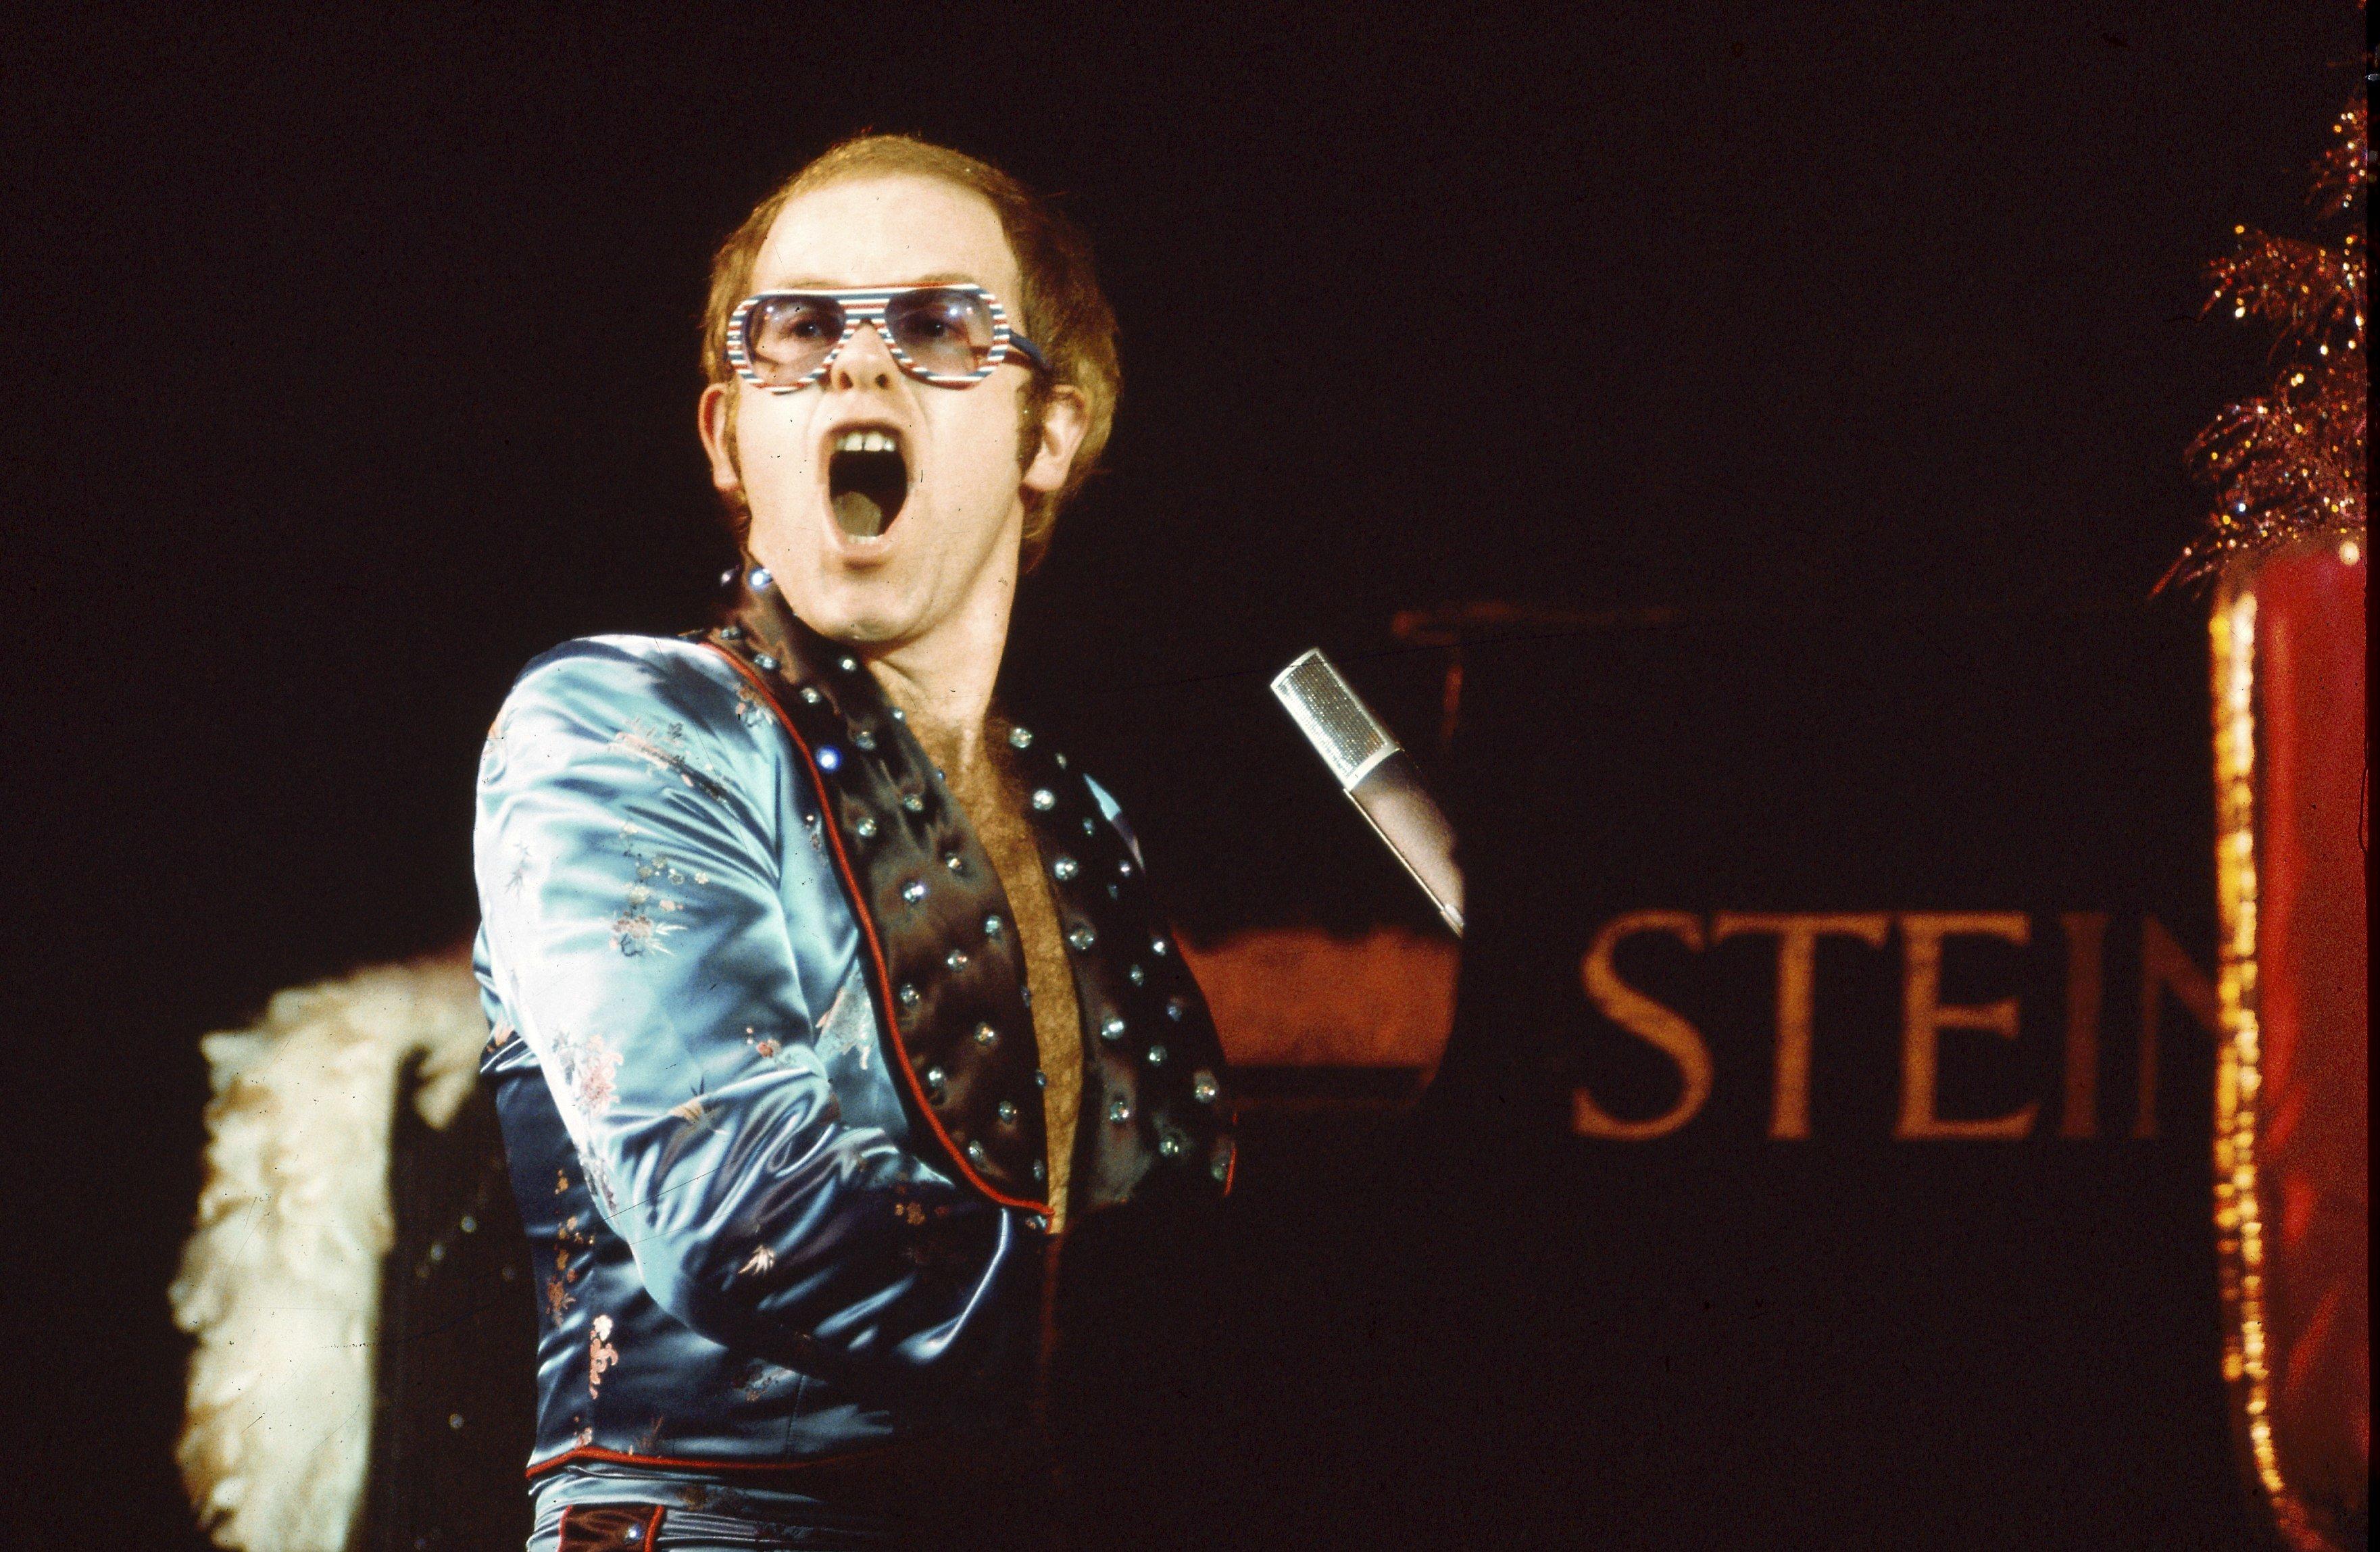 Taron Egerton Looks Fantastic As Elton John In 'Rocketman' Biopic